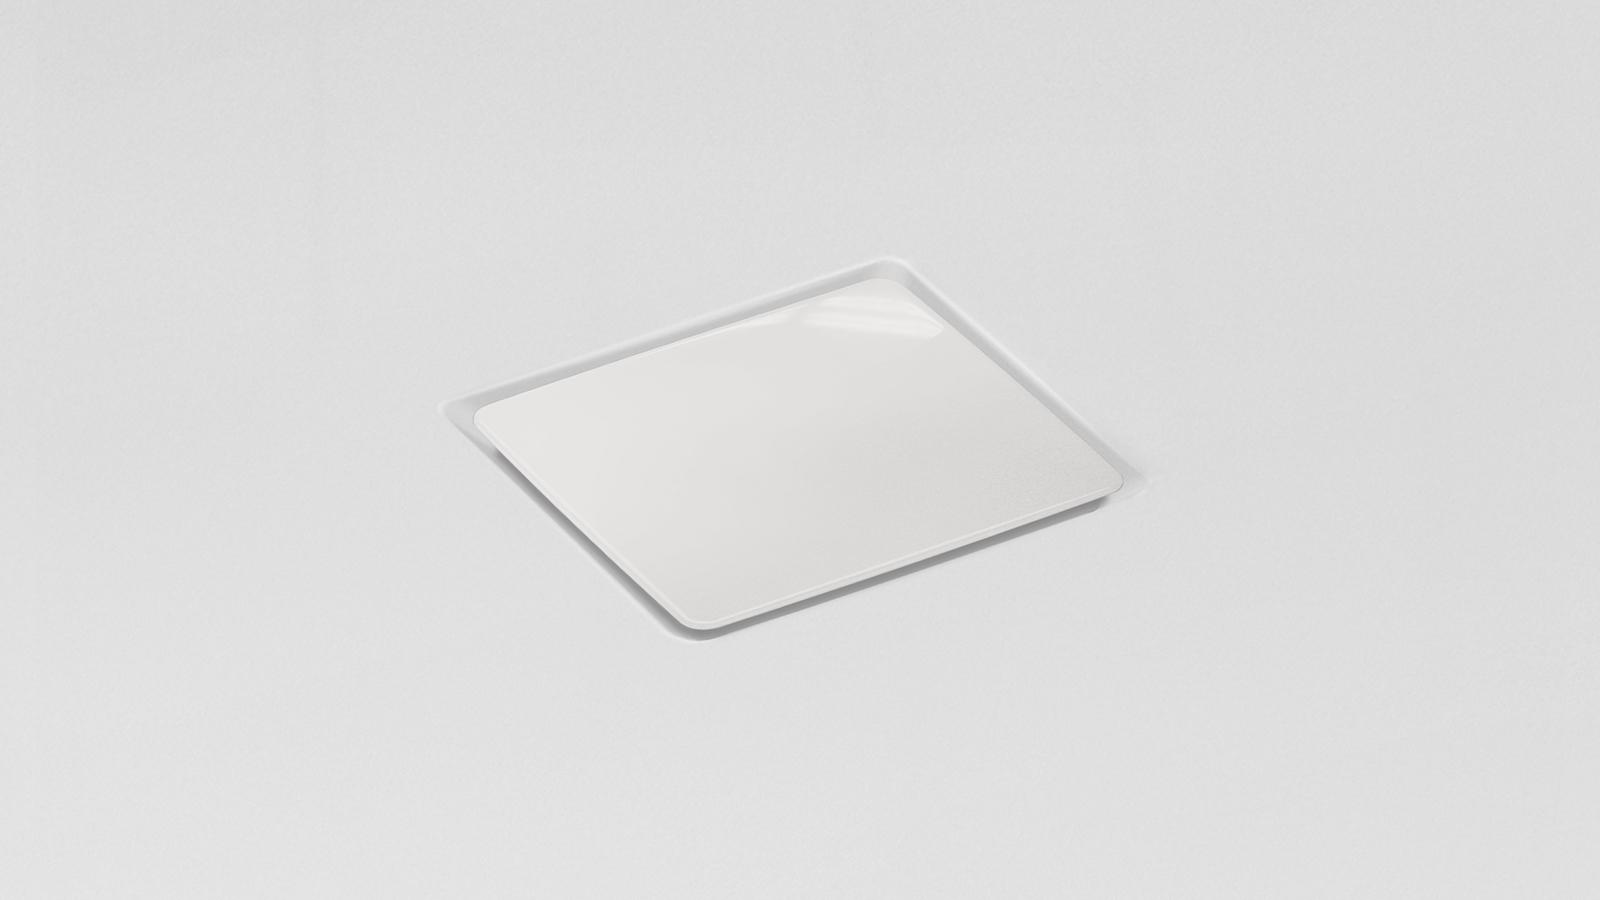 White Solid Square Shower Drain